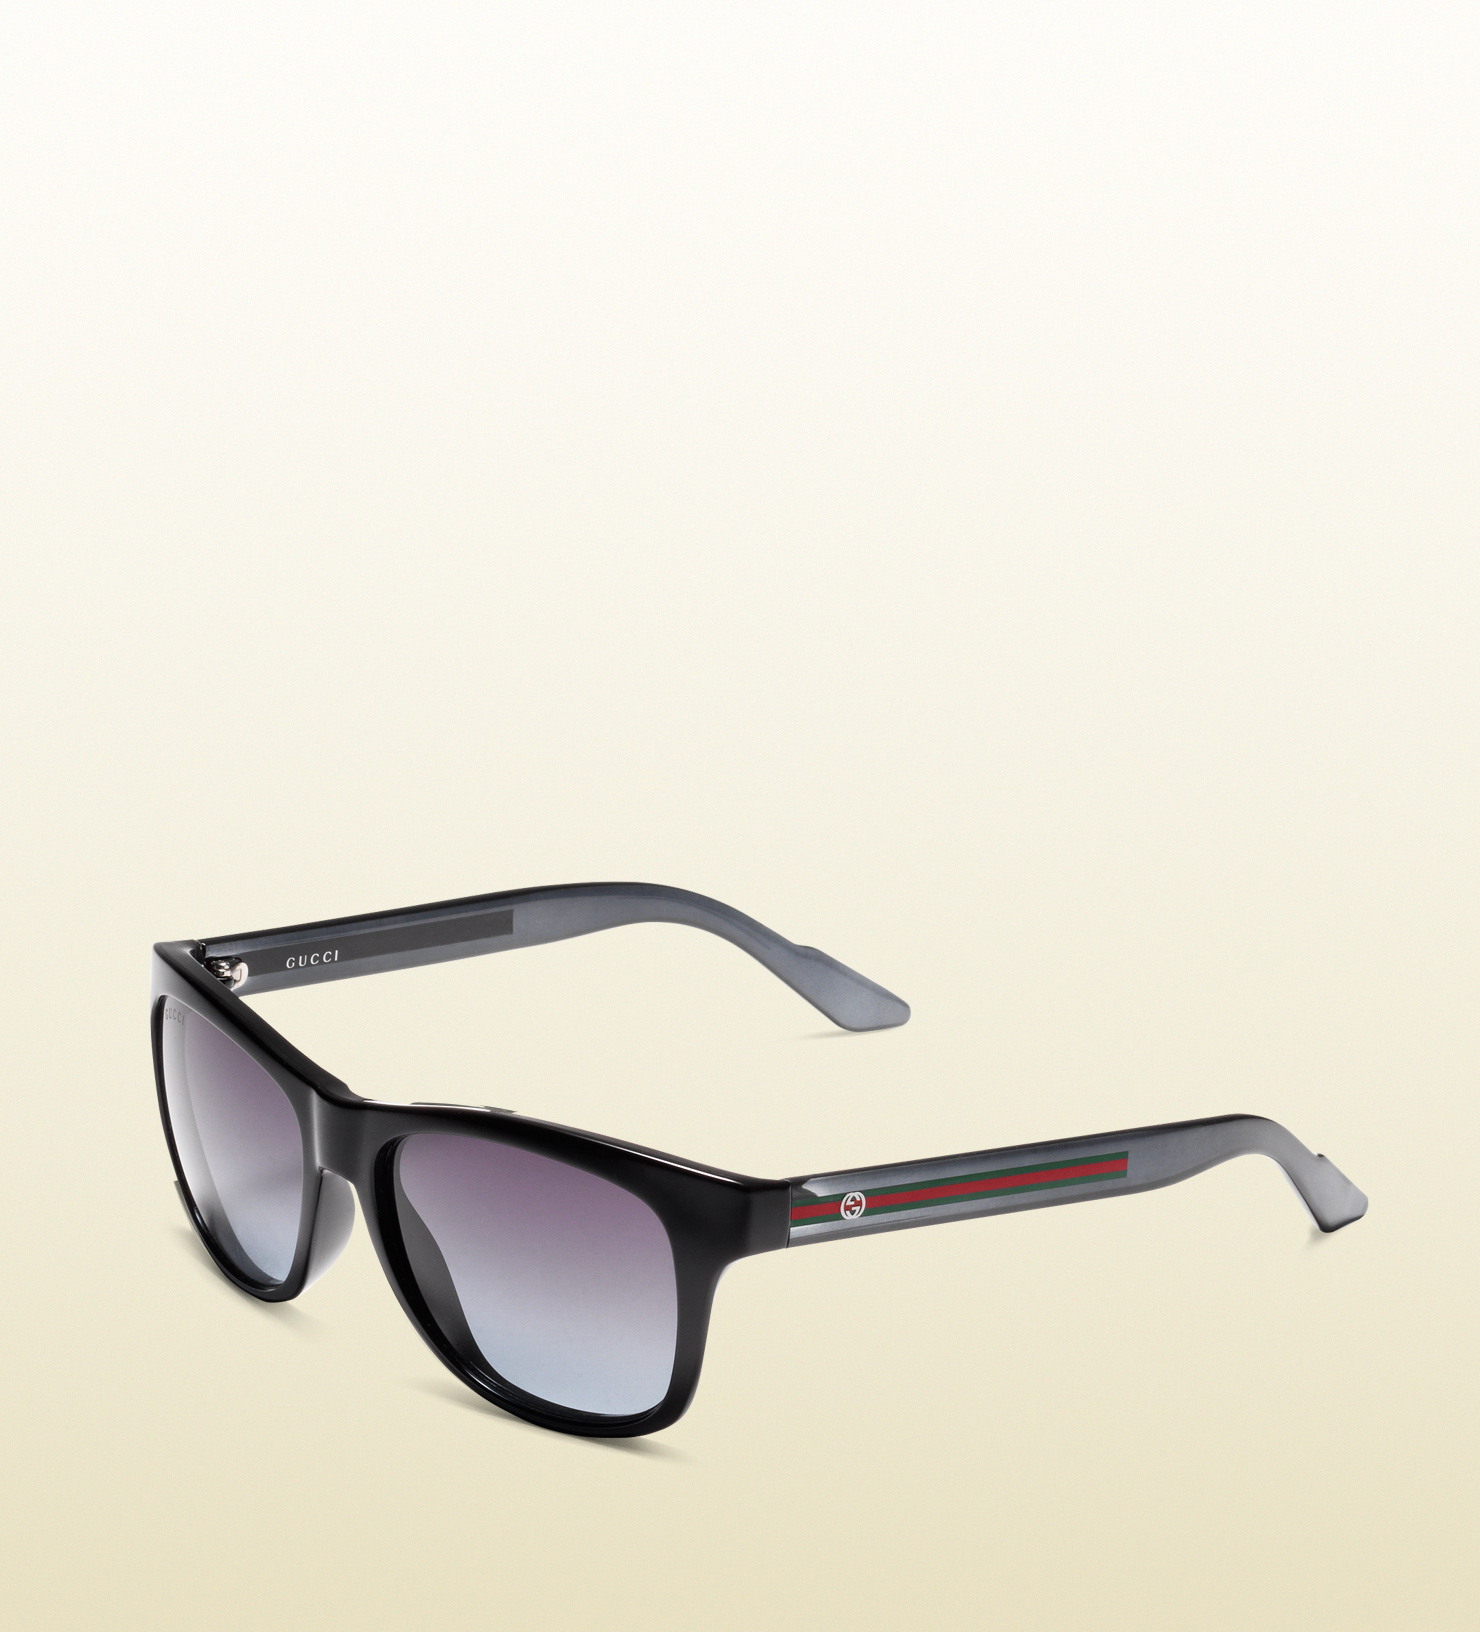 c006254791 Gucci Bio-based Rectangle Web Sunglasses in Black for Men - Lyst